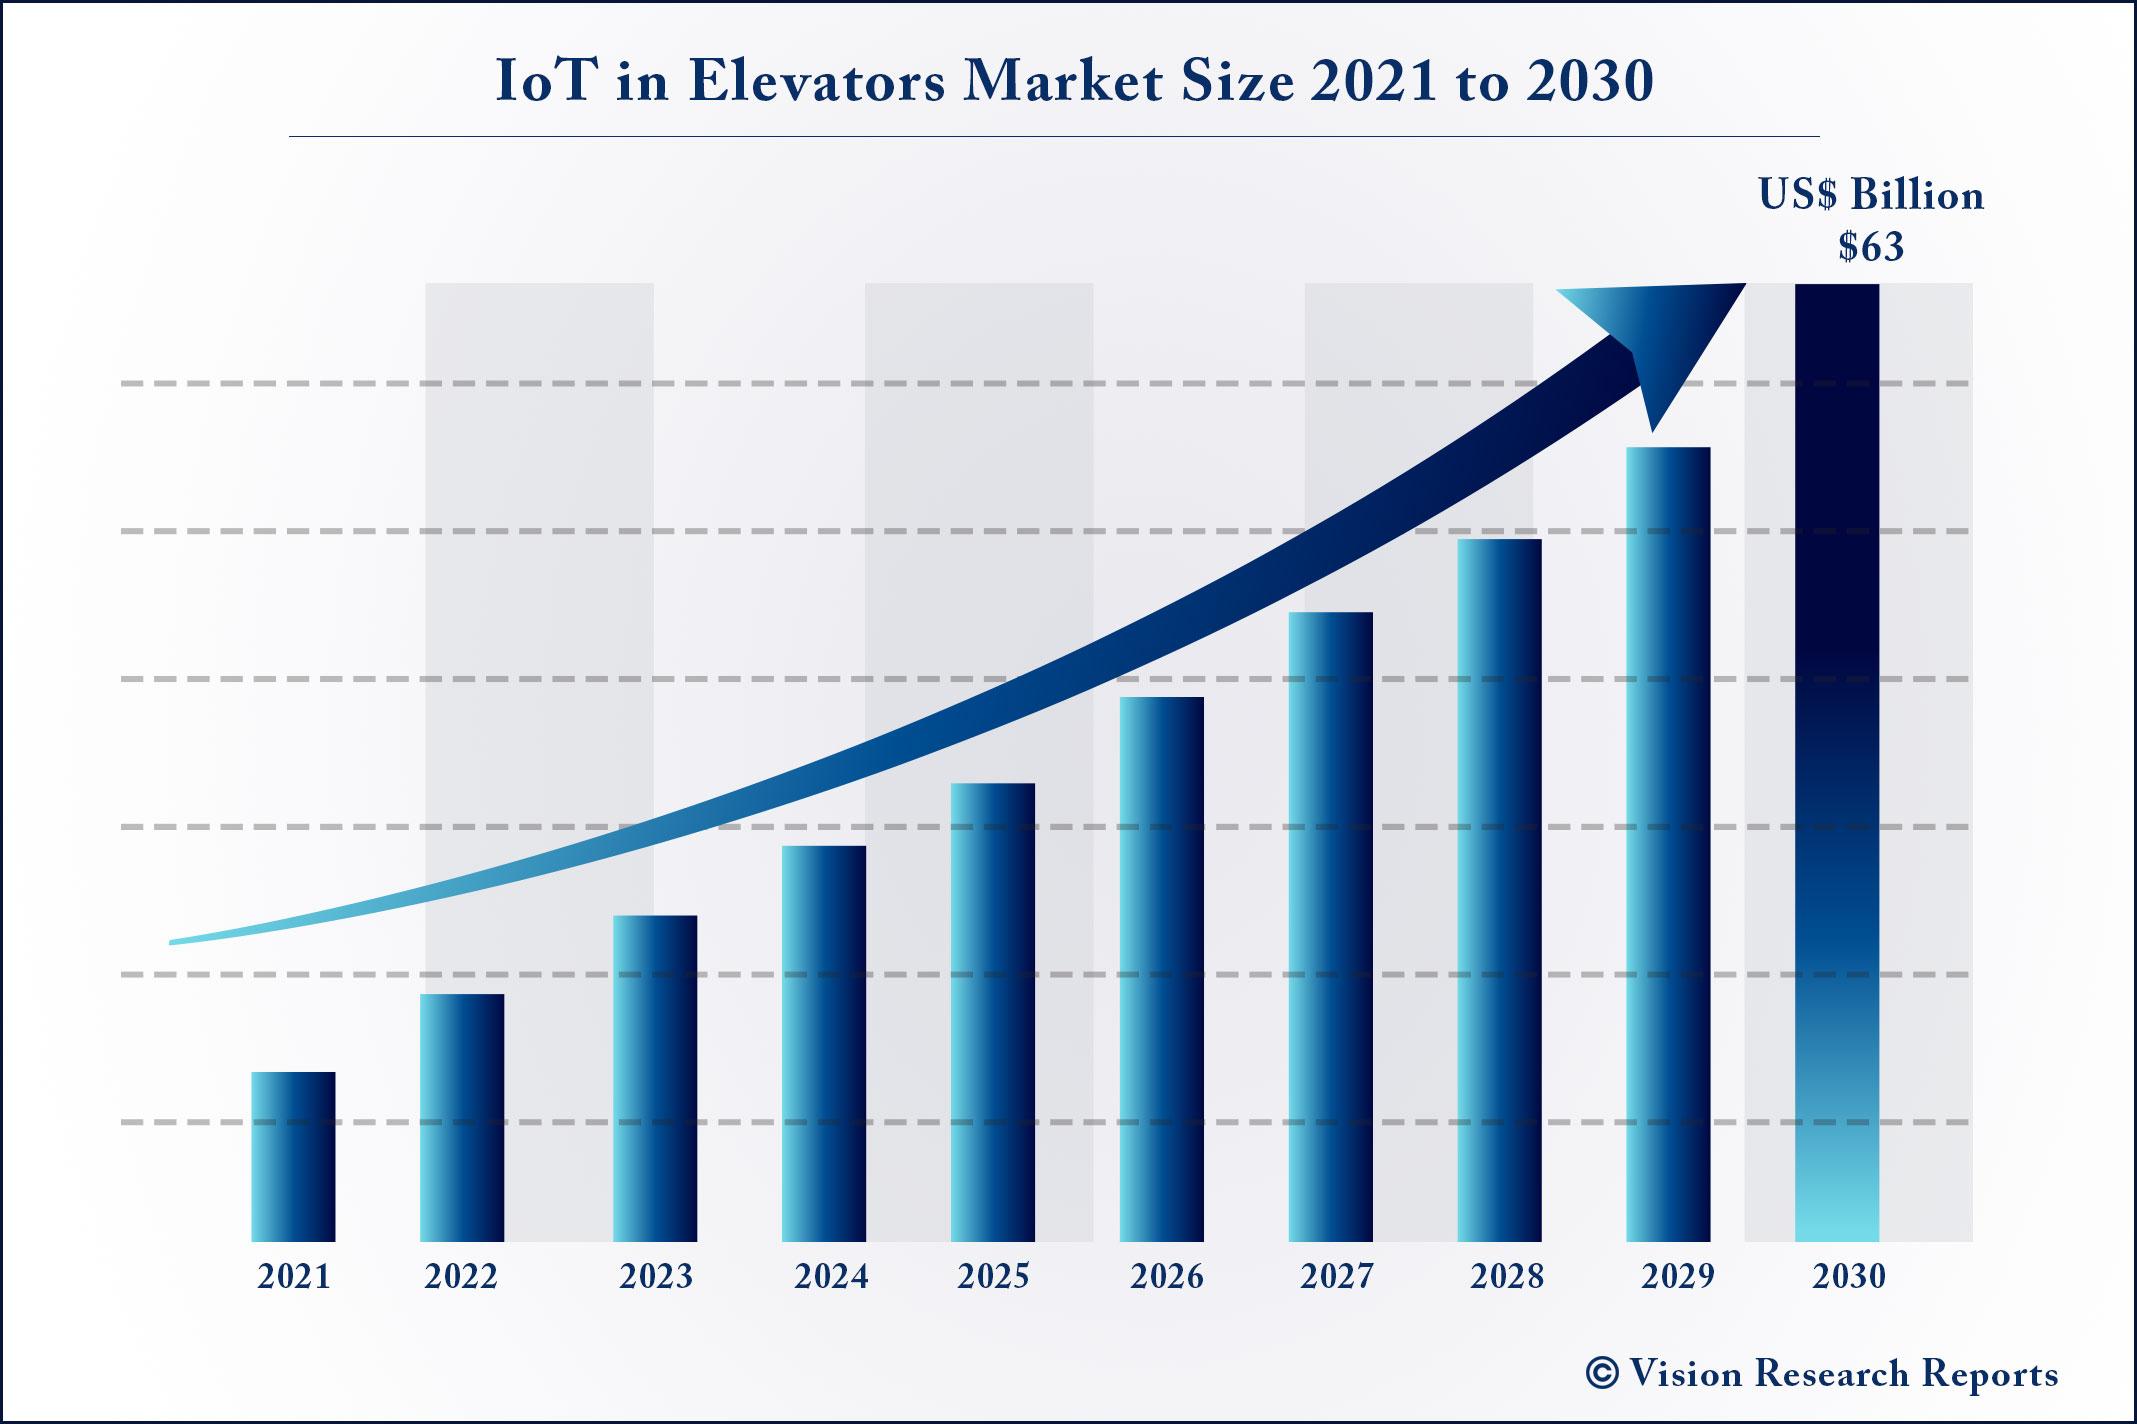 IoT in Elevators Market Size 2021 to 2030